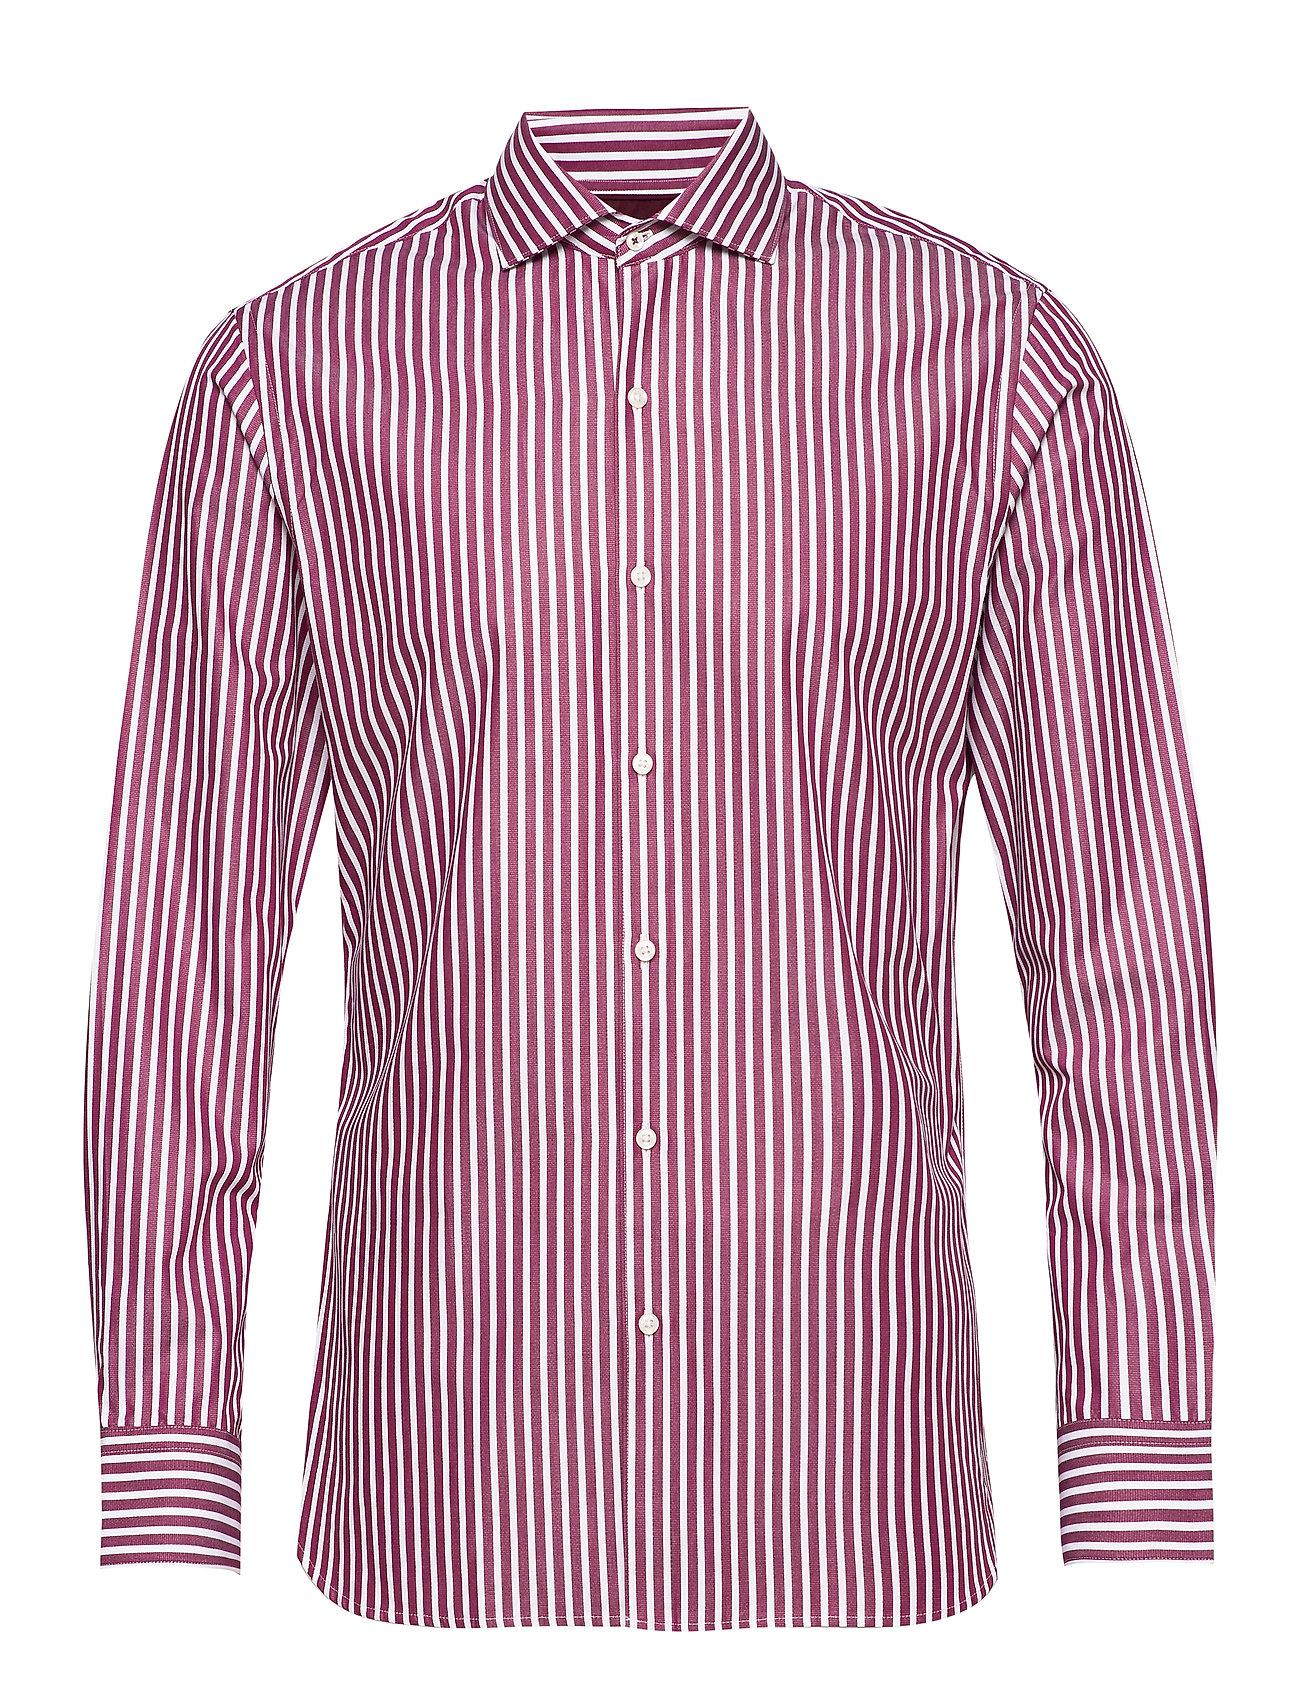 Mango Man Slim fit patterned striped shirt - DARK RED